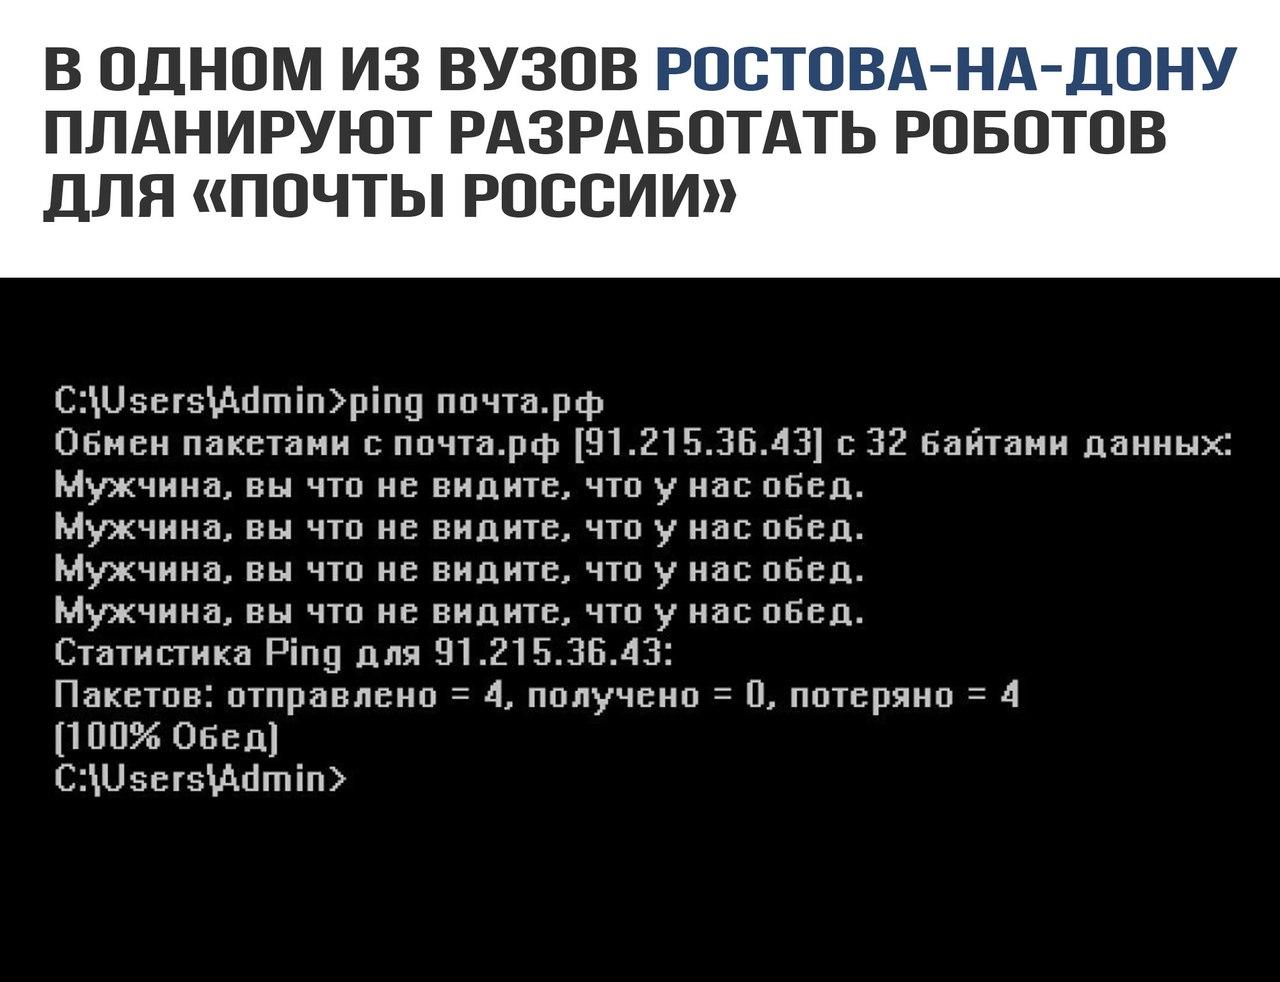 https://pp.userapi.com/c845120/v845120359/5a0b7/io2-_IjOBvg.jpg